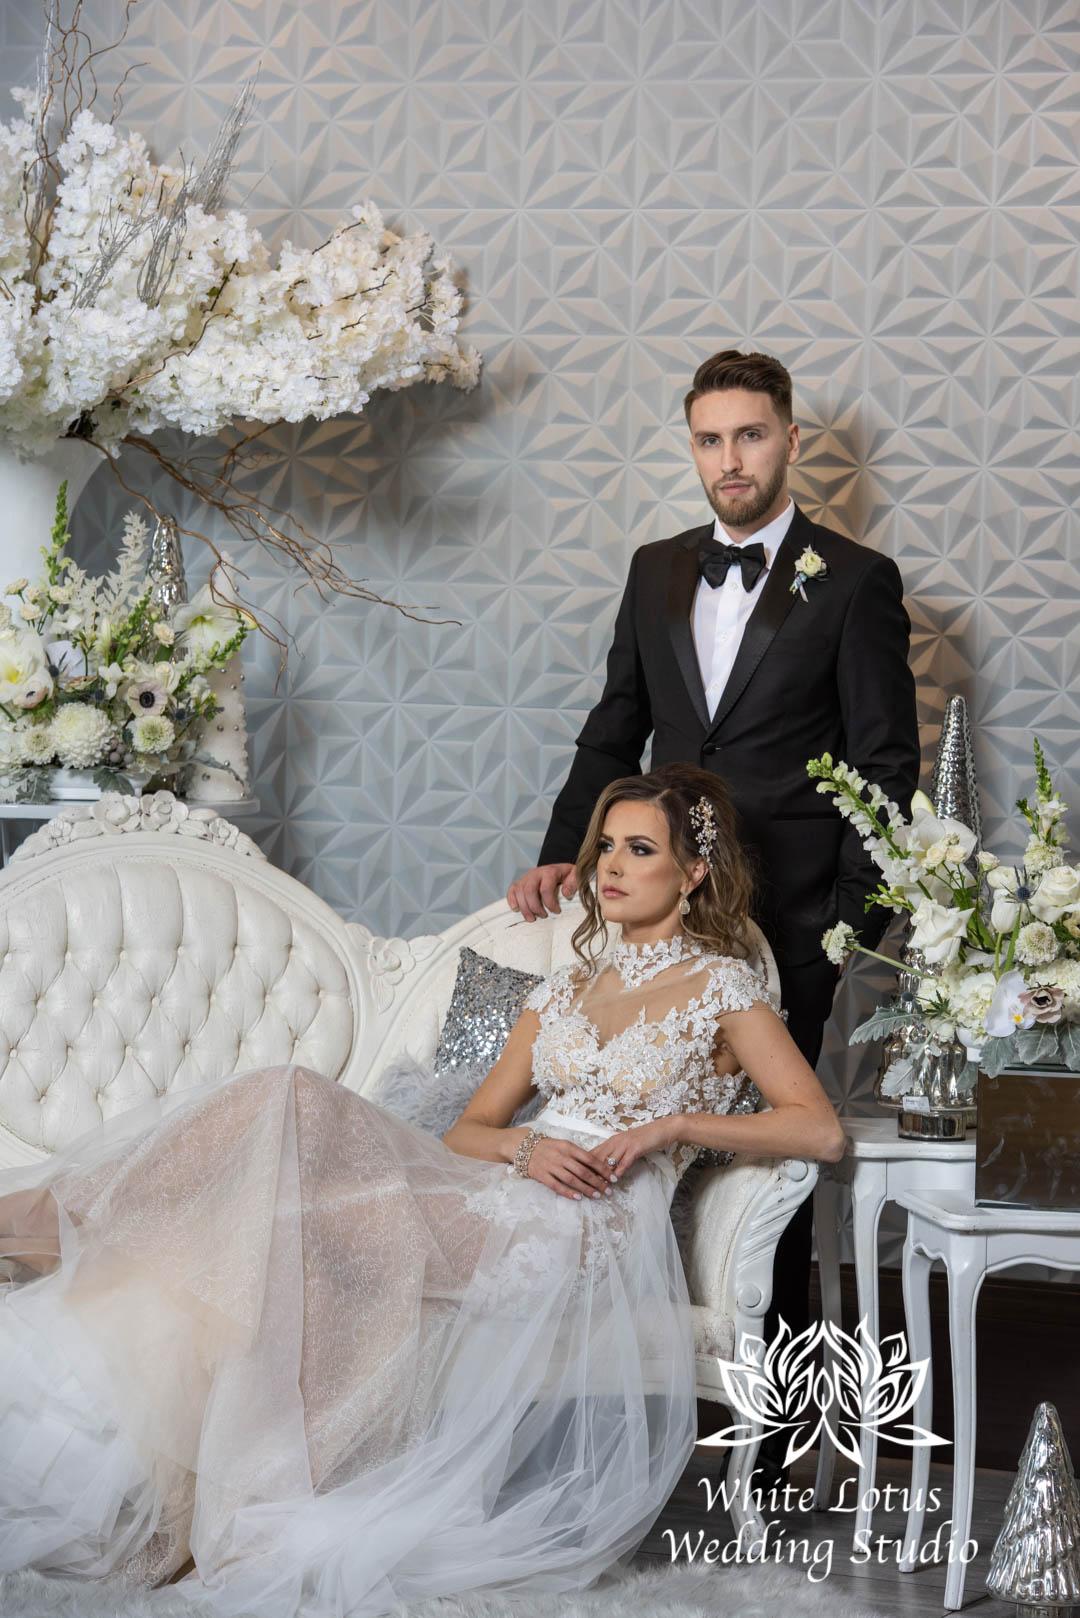 061- GLAM WINTERLUXE WEDDING INSPIRATION